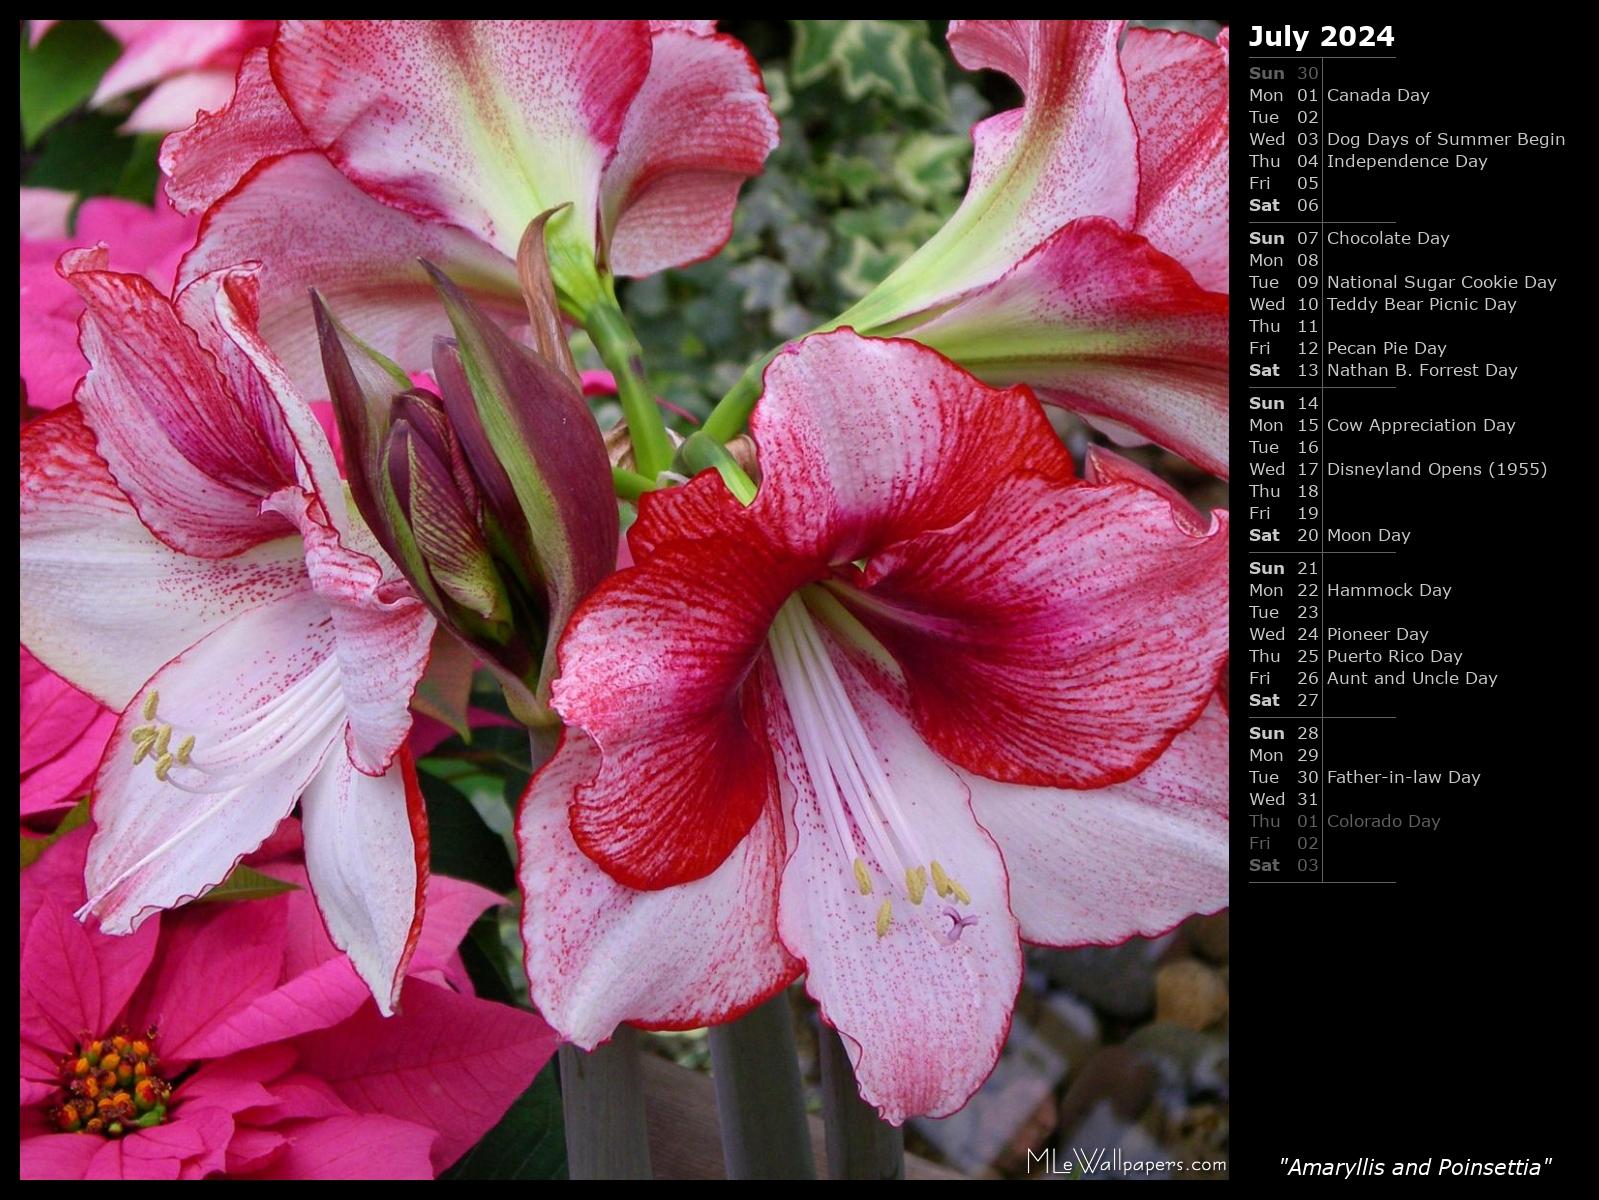 Mlewallpapers Amaryllis And Poinsettia Calendar